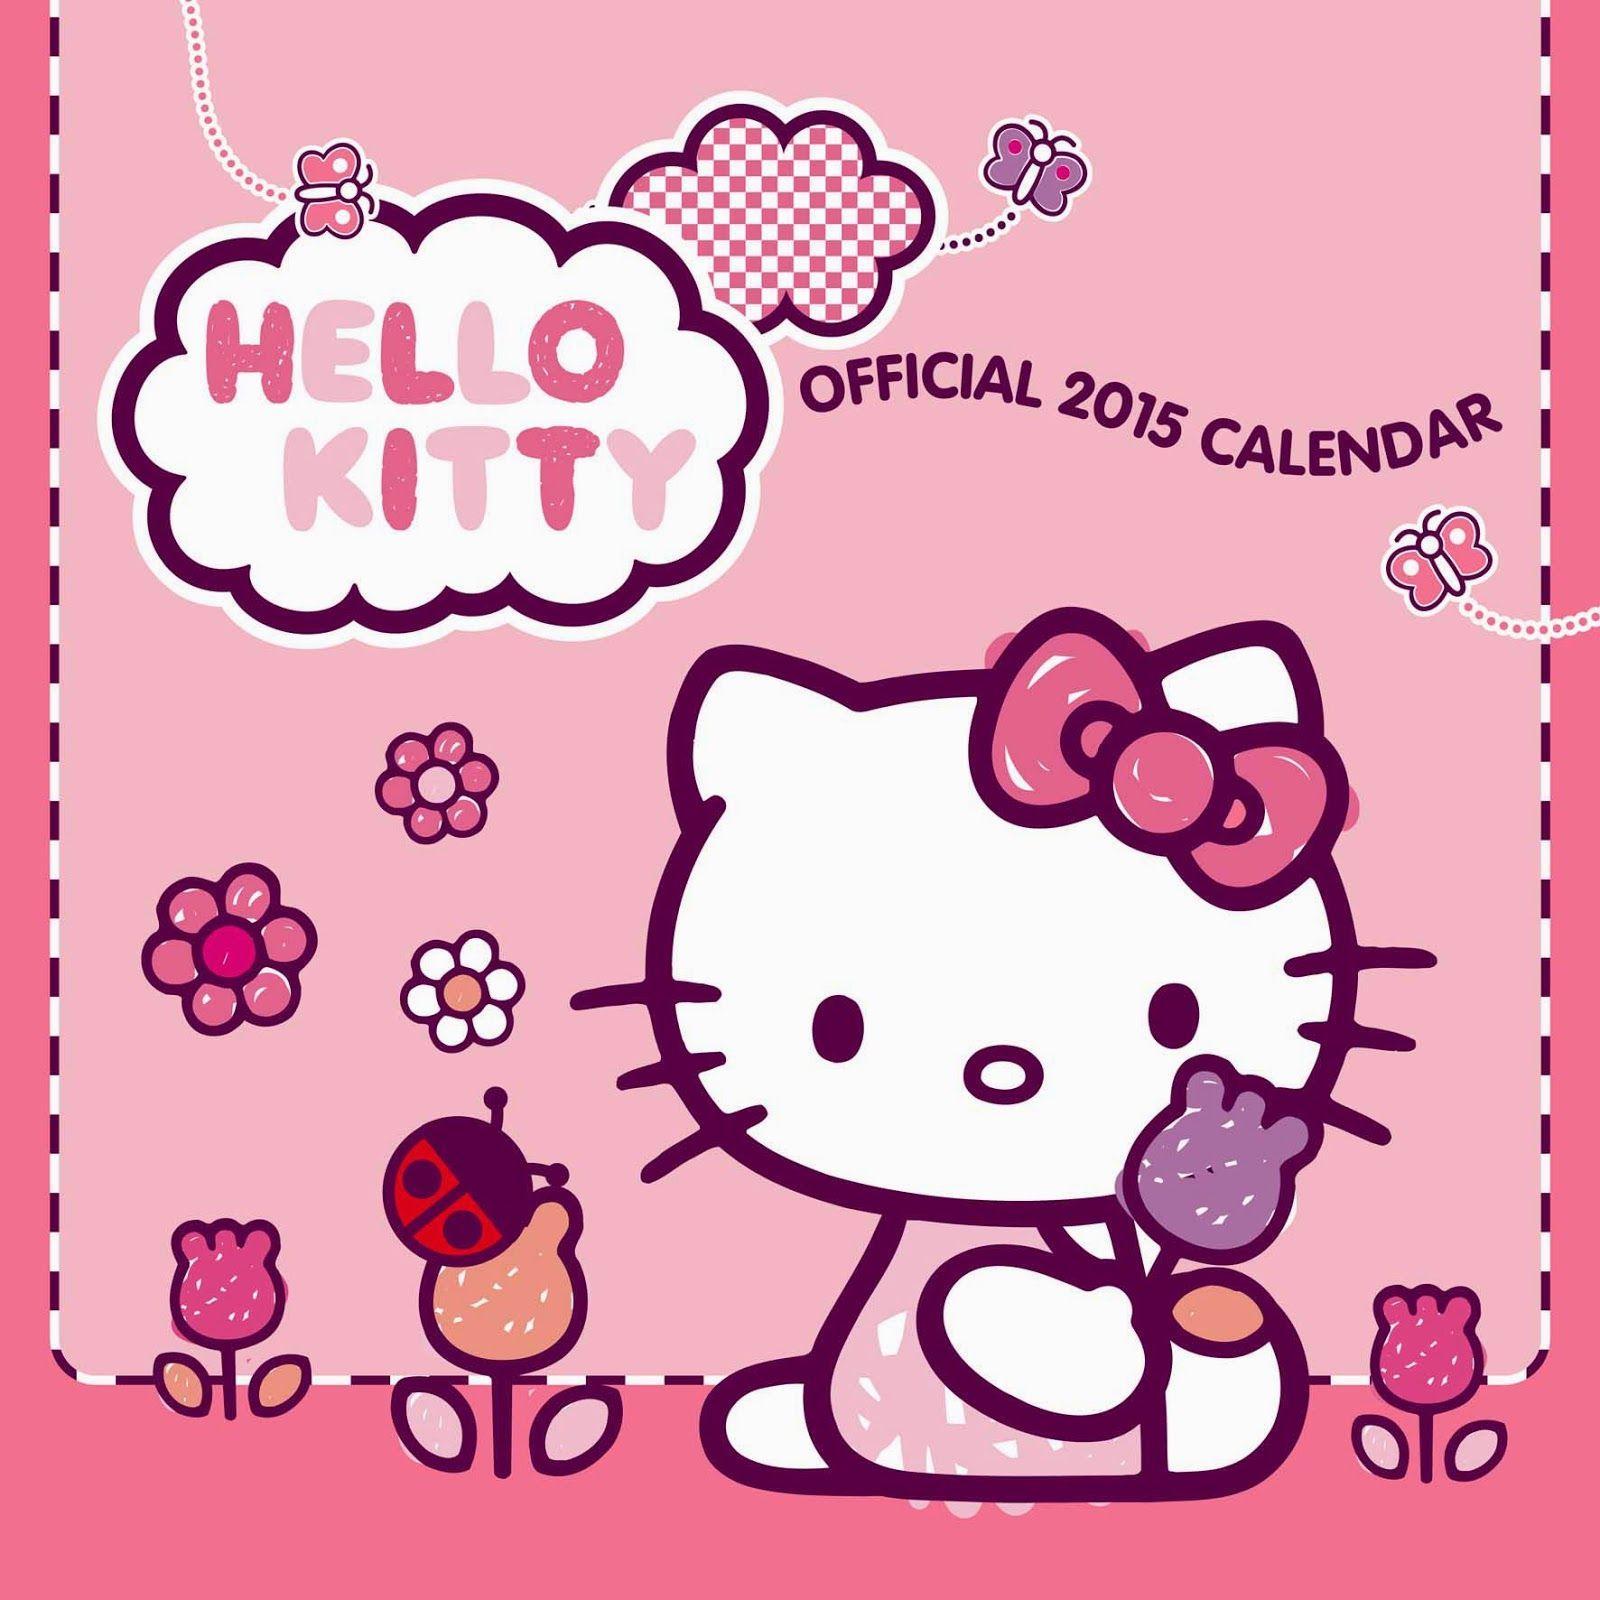 best Hello Kitty images on Pinterest